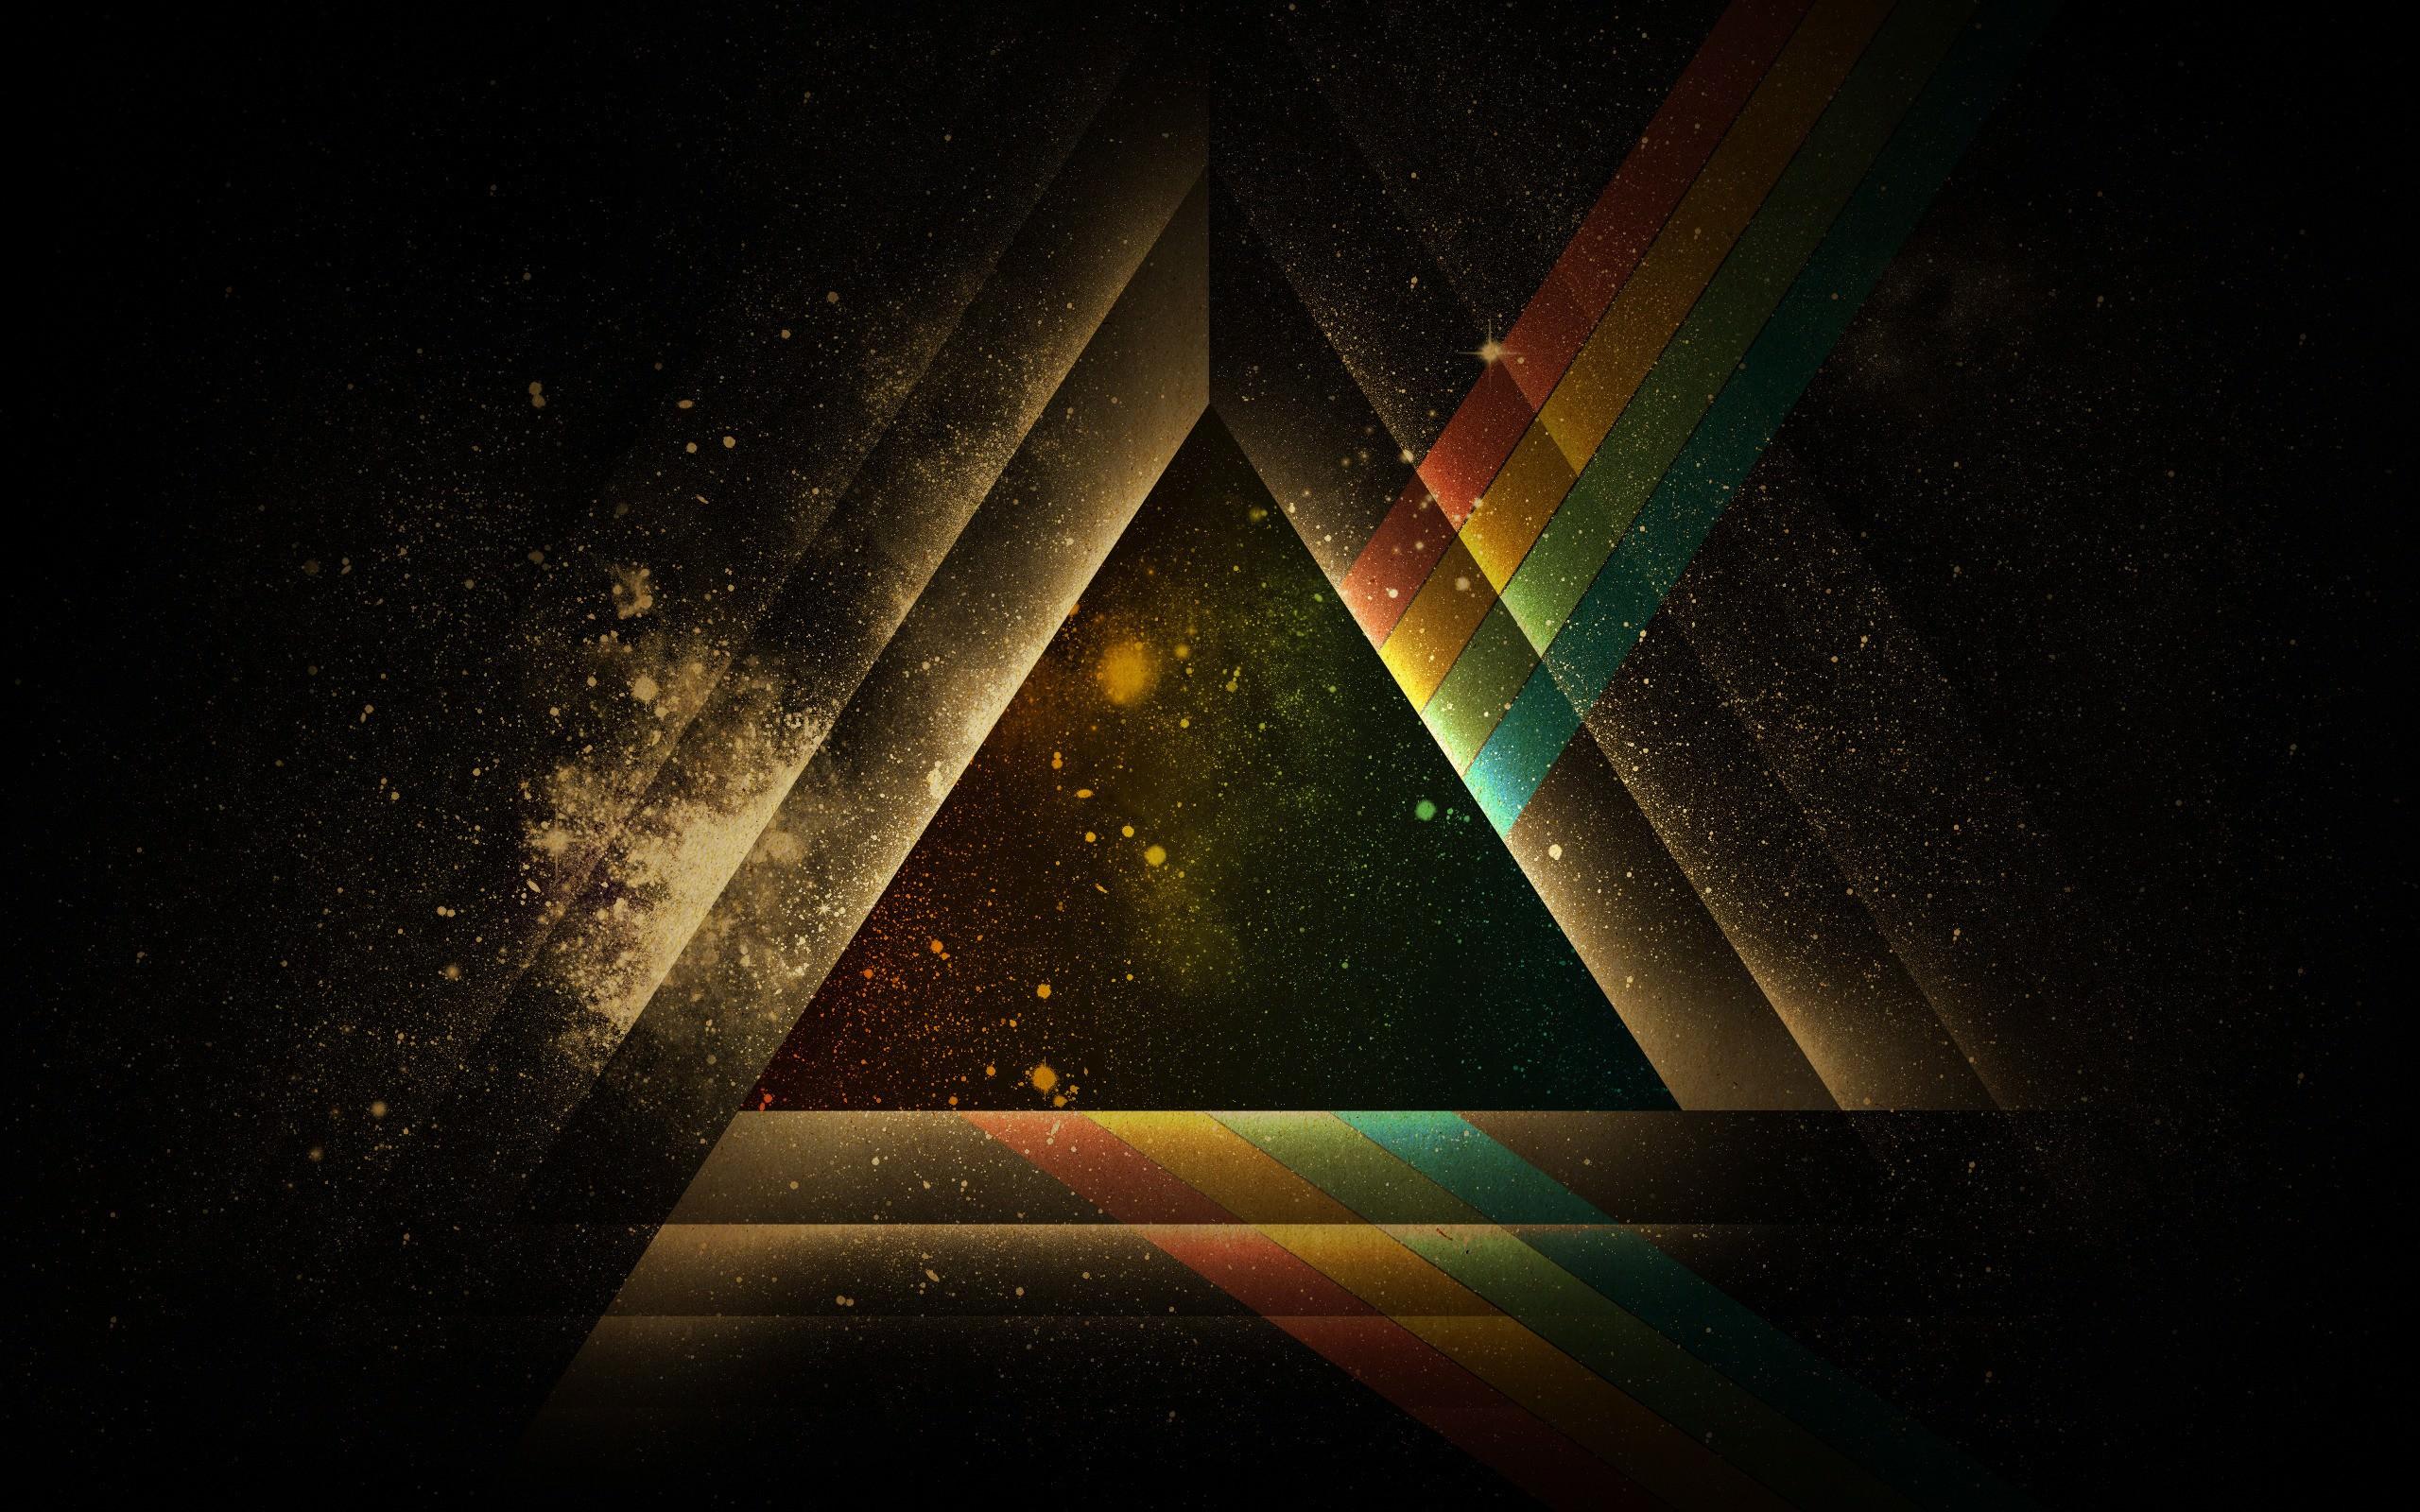 Pink Floyd Abstract Prism Wallpaper   DigitalArtio 2560x1600